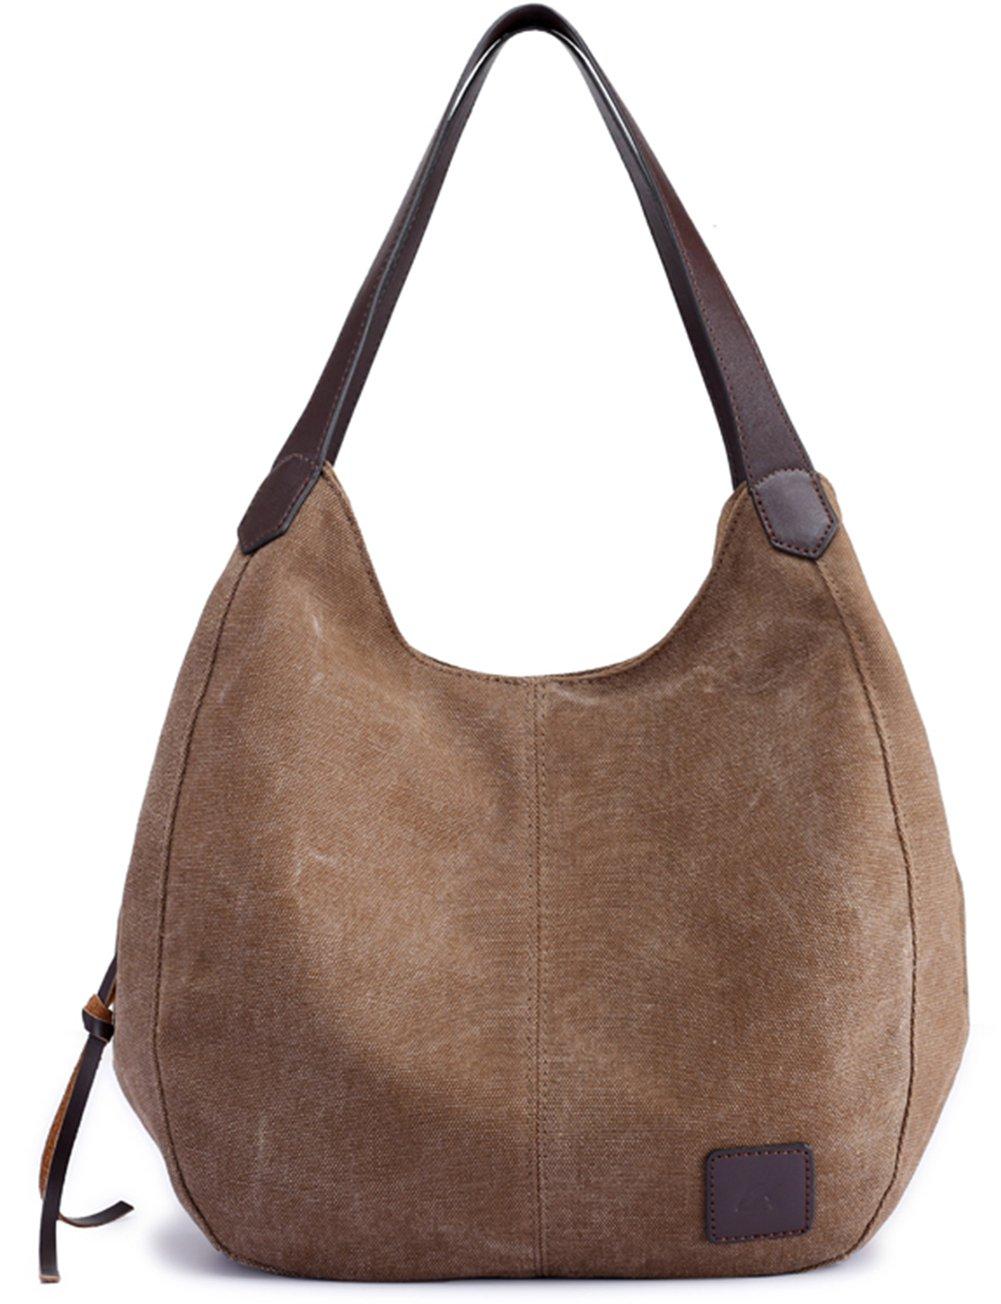 Luckysmile Canvas Hobo Bag Top Handle Tote Handbag Travel Shopping Bag for Women